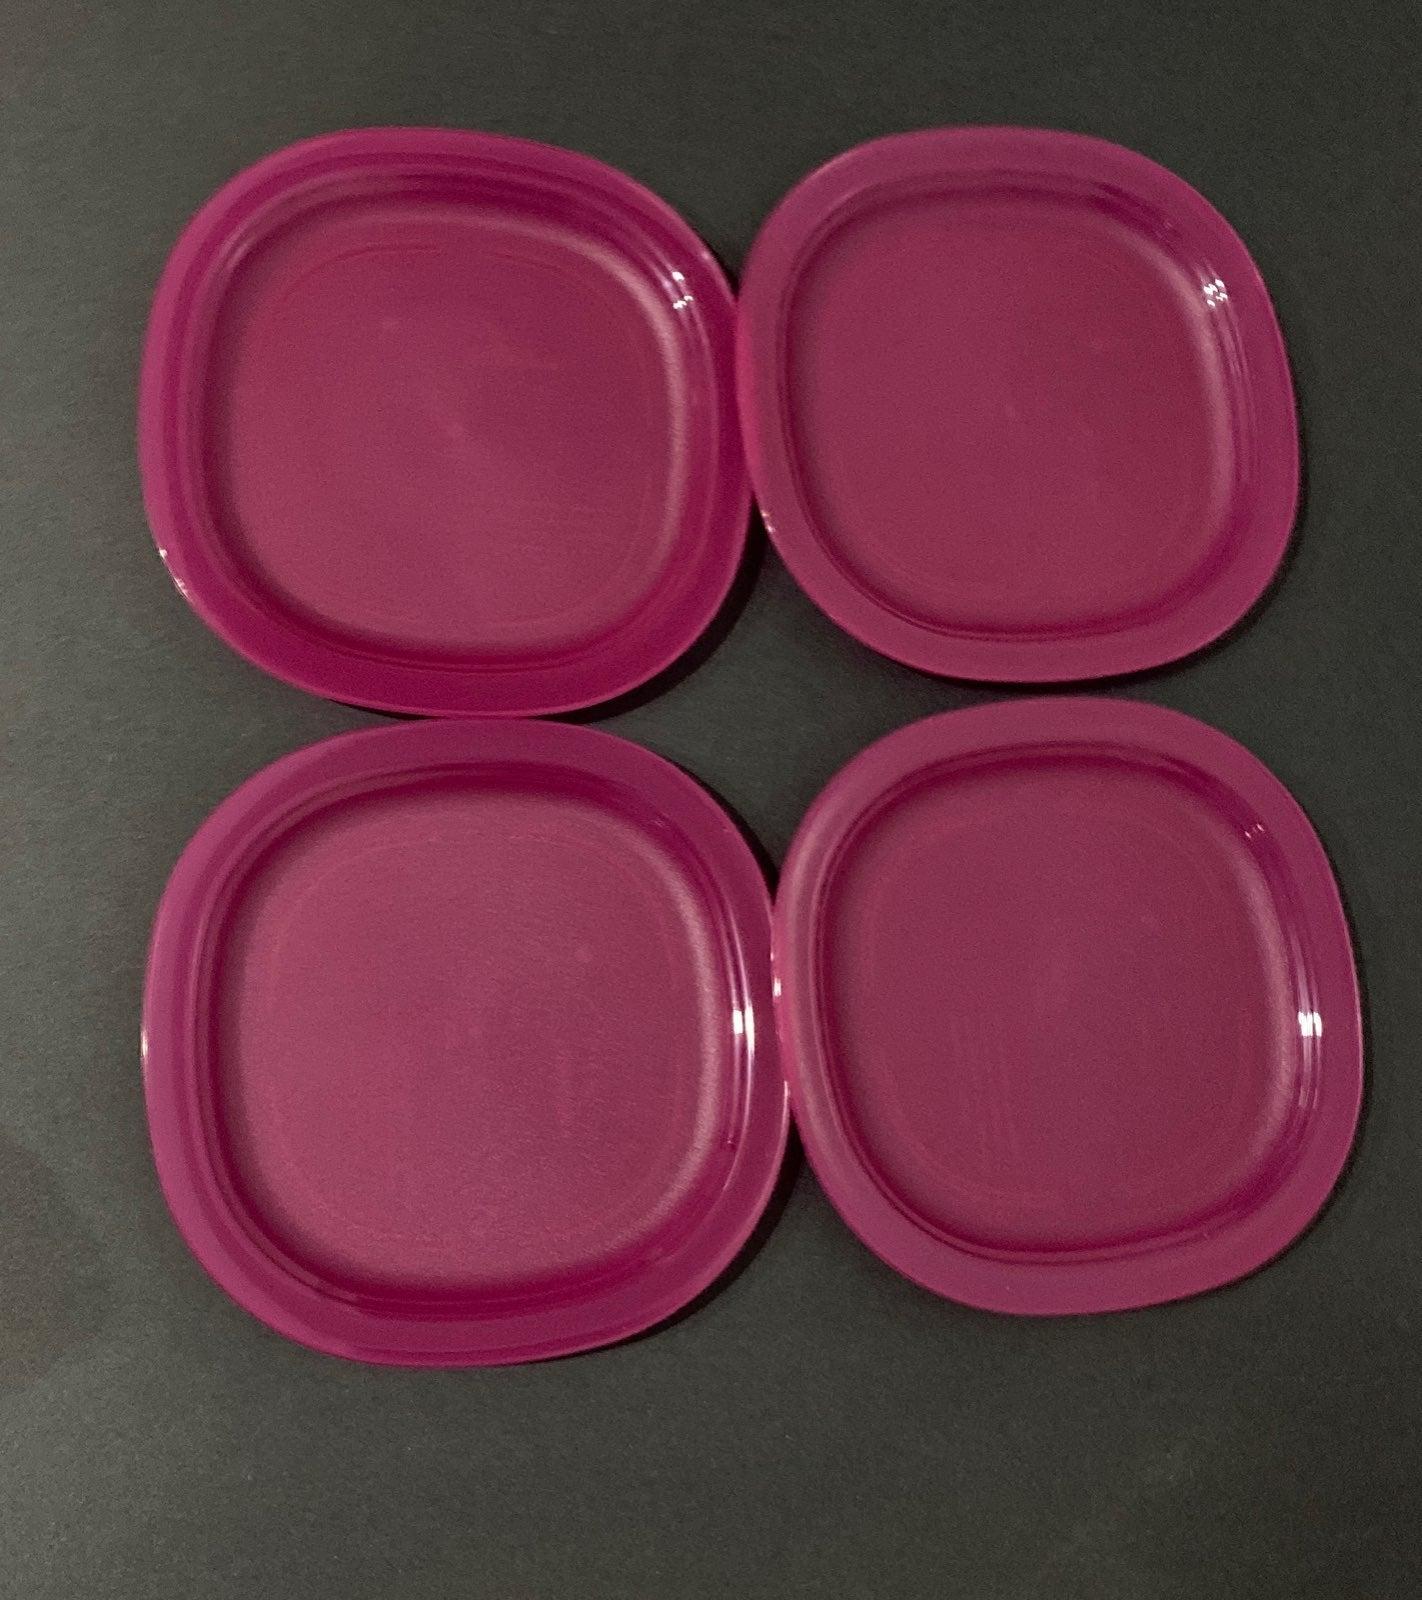 New!Tupperware set of 4  luncheon desser